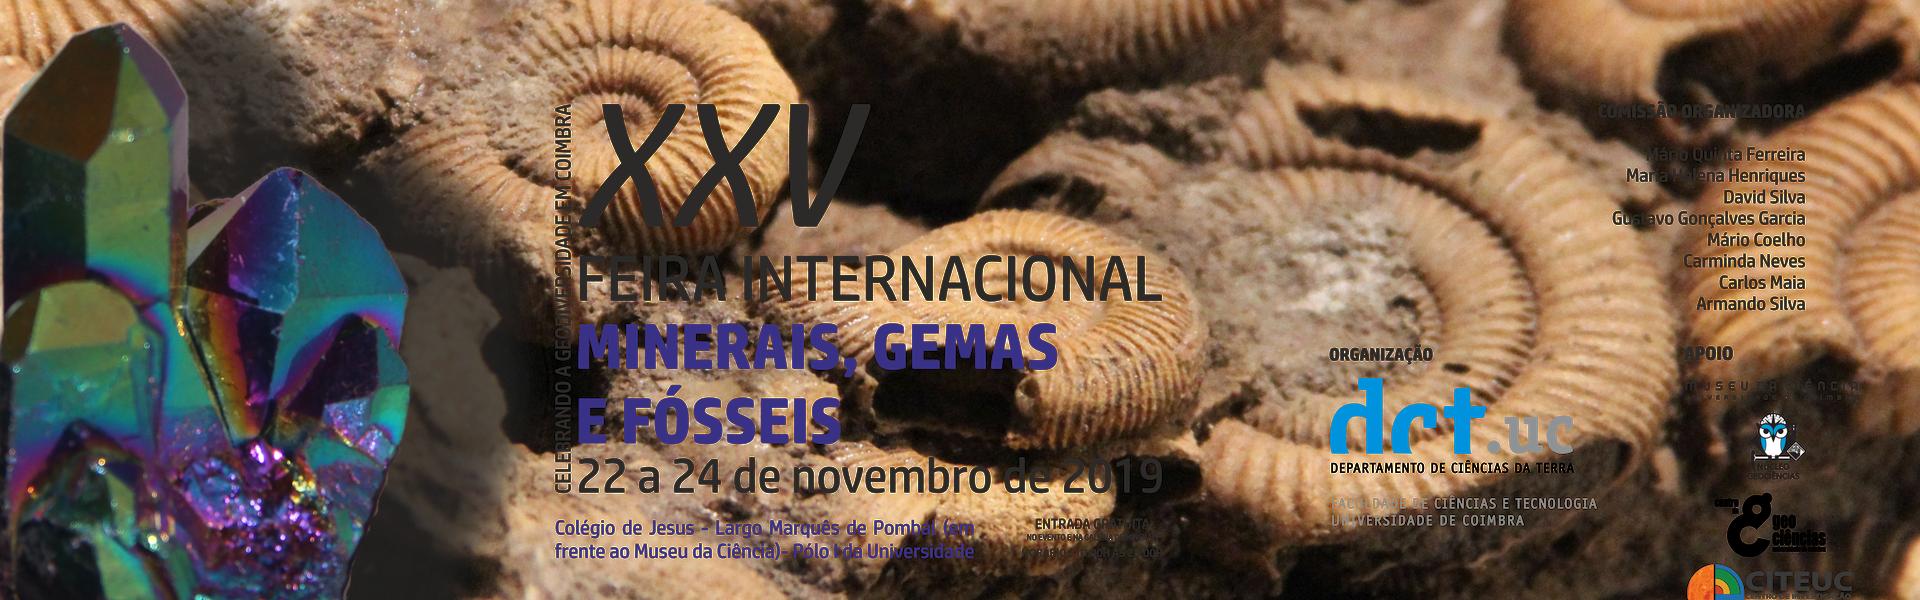 XXV Feira Internacional de Minerais, Gemas e Fósseis de Coimbra